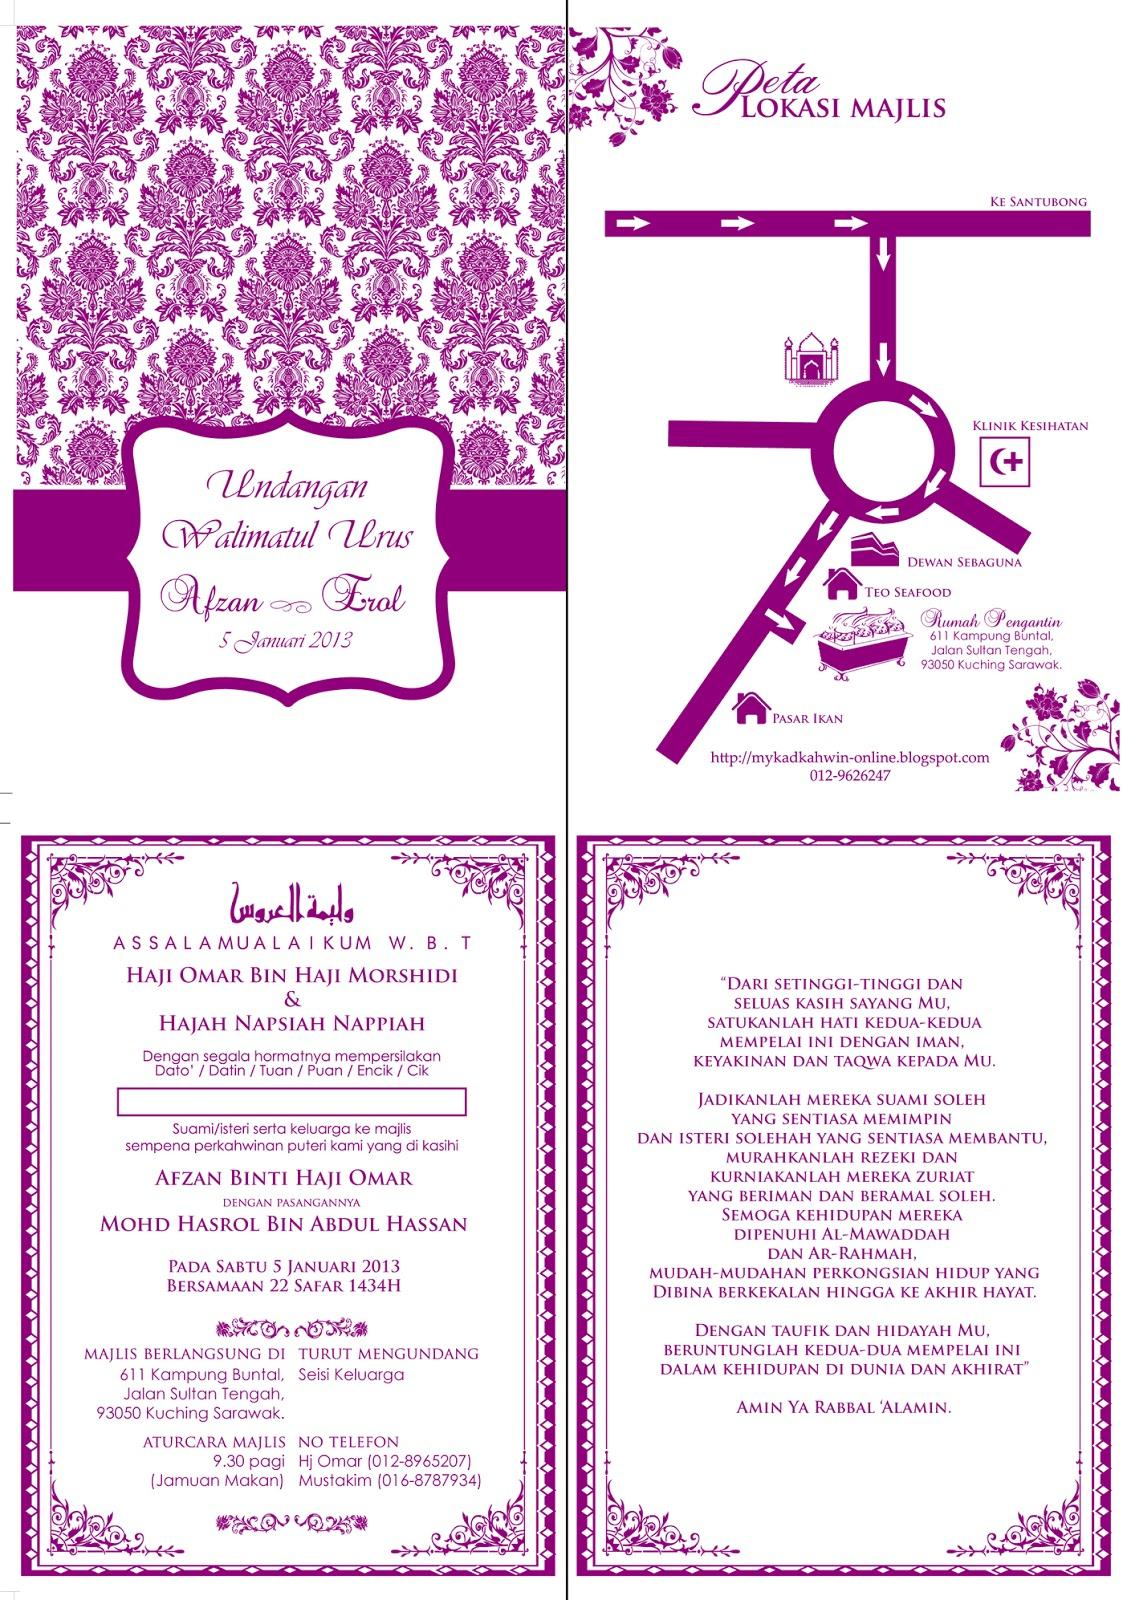 Kad Kahwin Area Kota Kinabalu Berbagai Bekalan Rumah